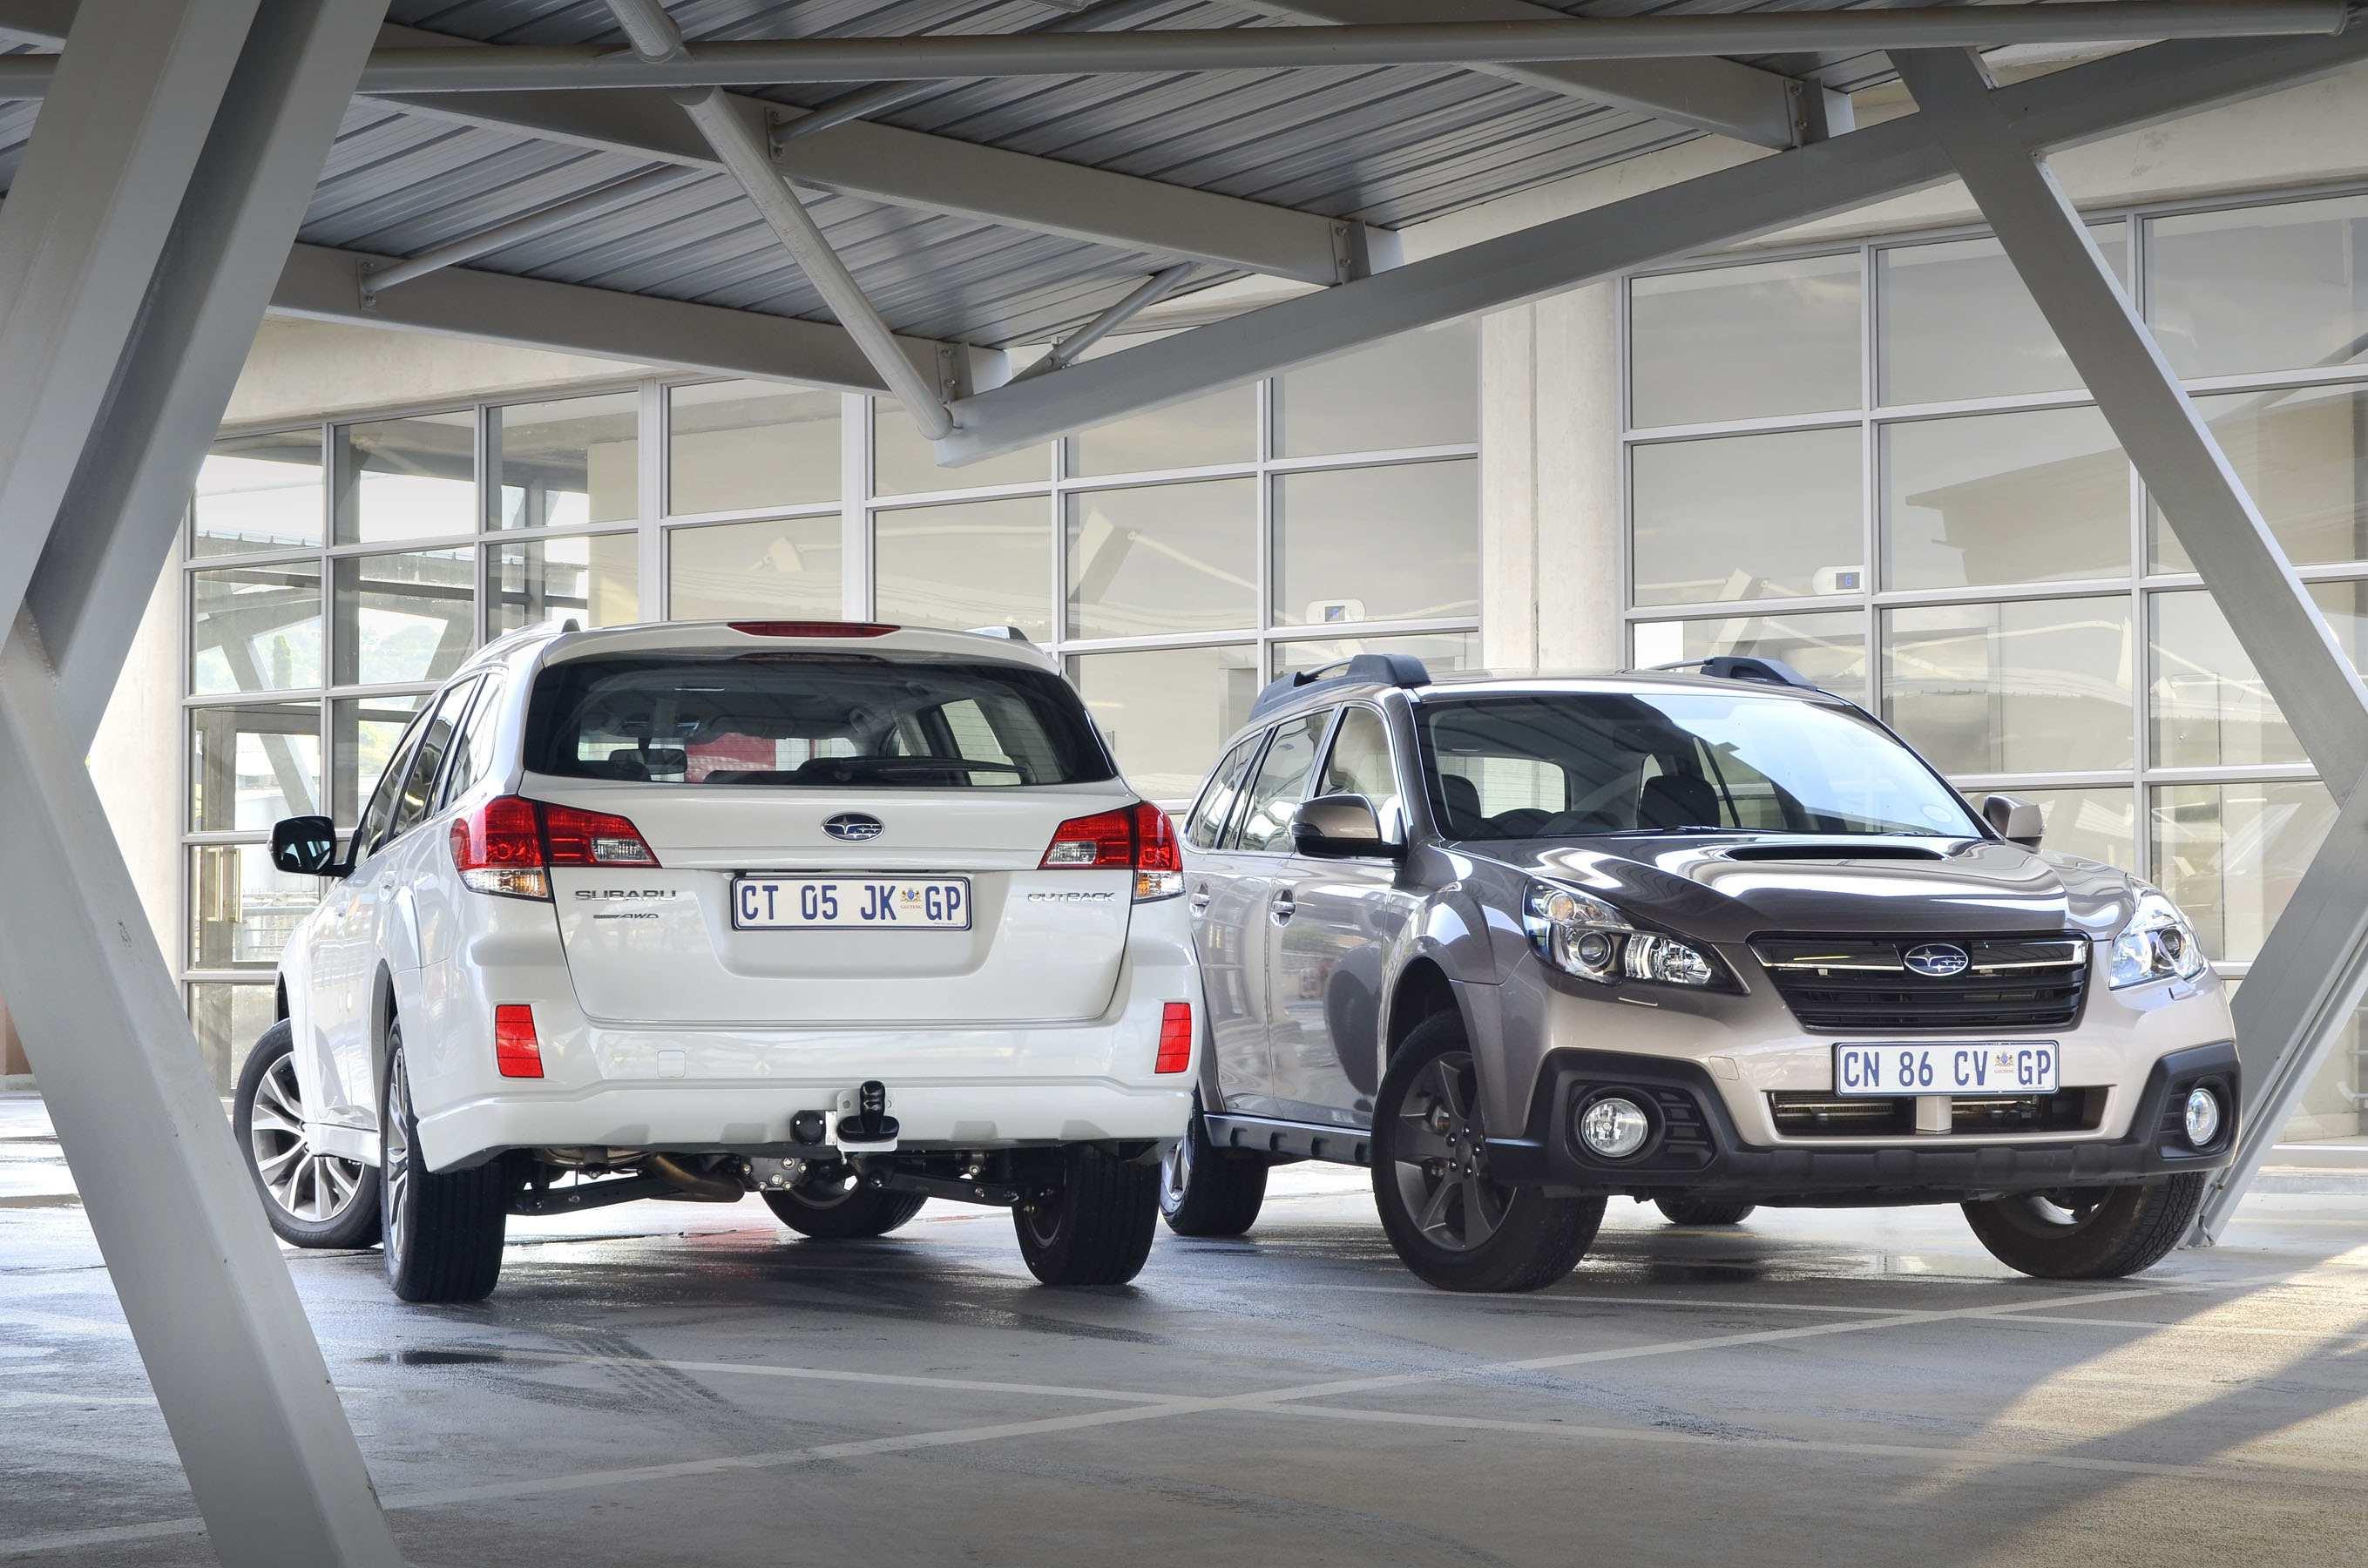 Subaru Outback Range Made Fresher: Latest News – Surf4cars